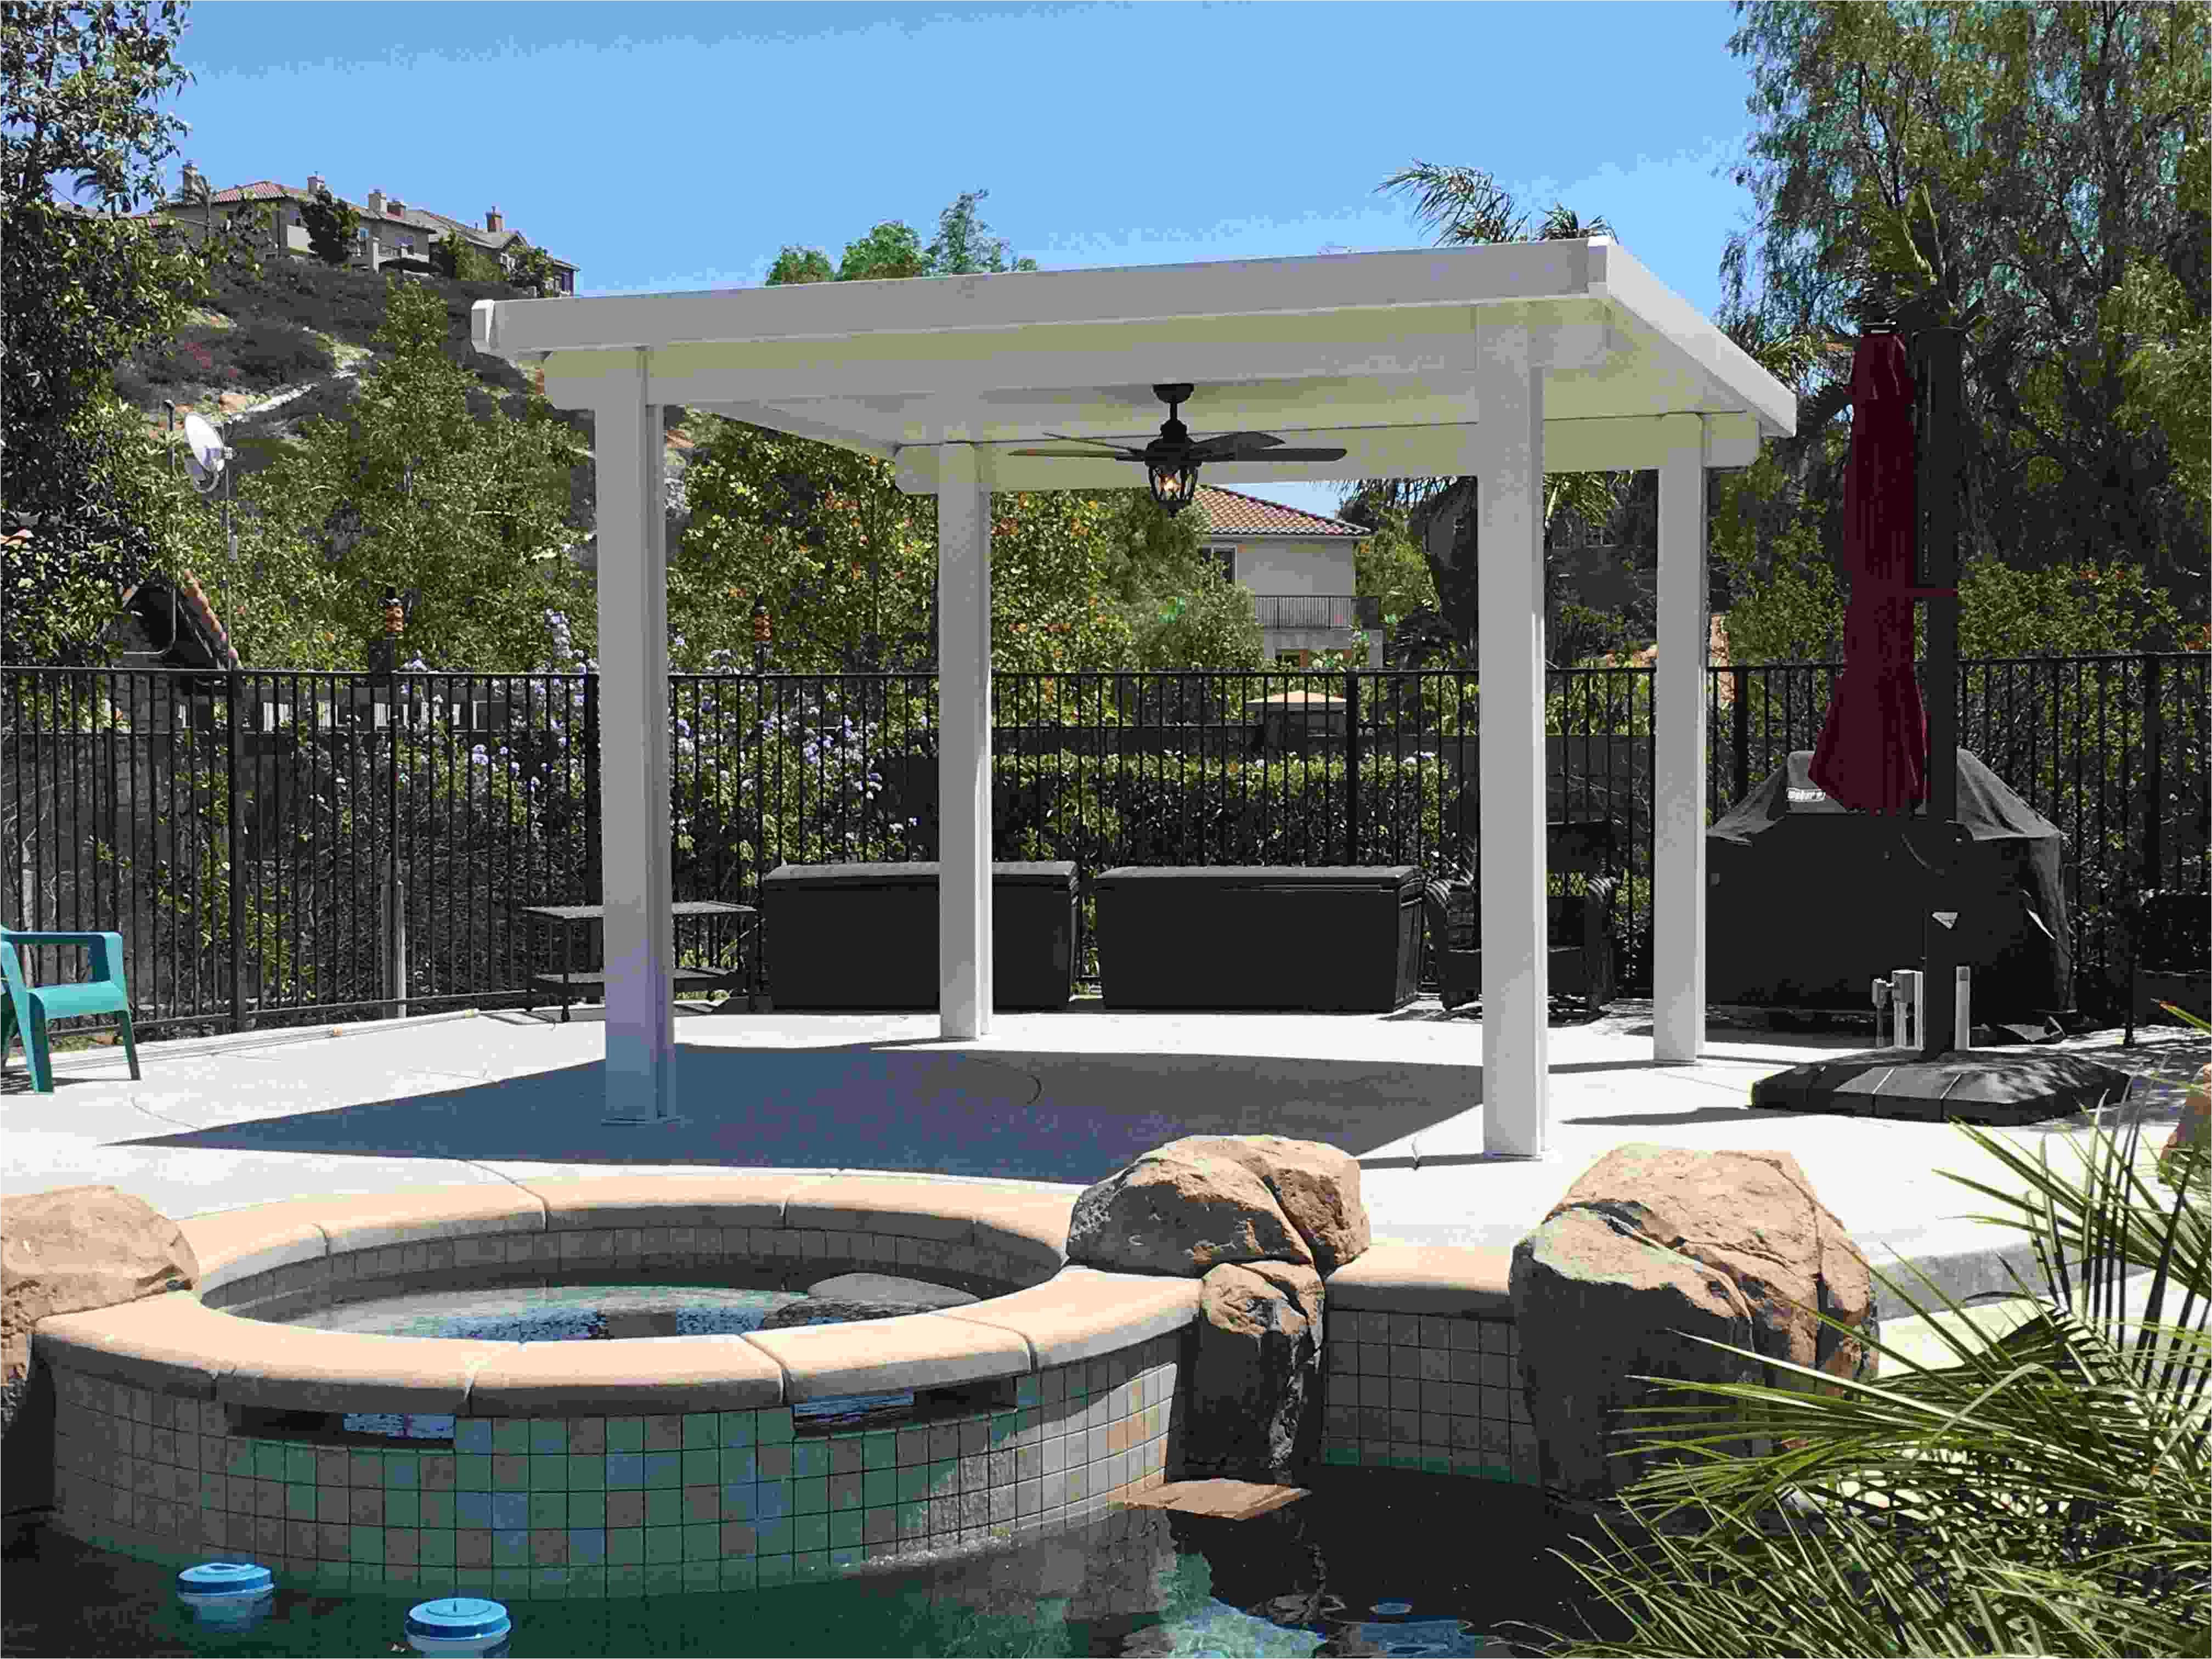 jh construction aluminum patio covers riverside 951 313 3395 alumawood patio covers pros and cons alumawood